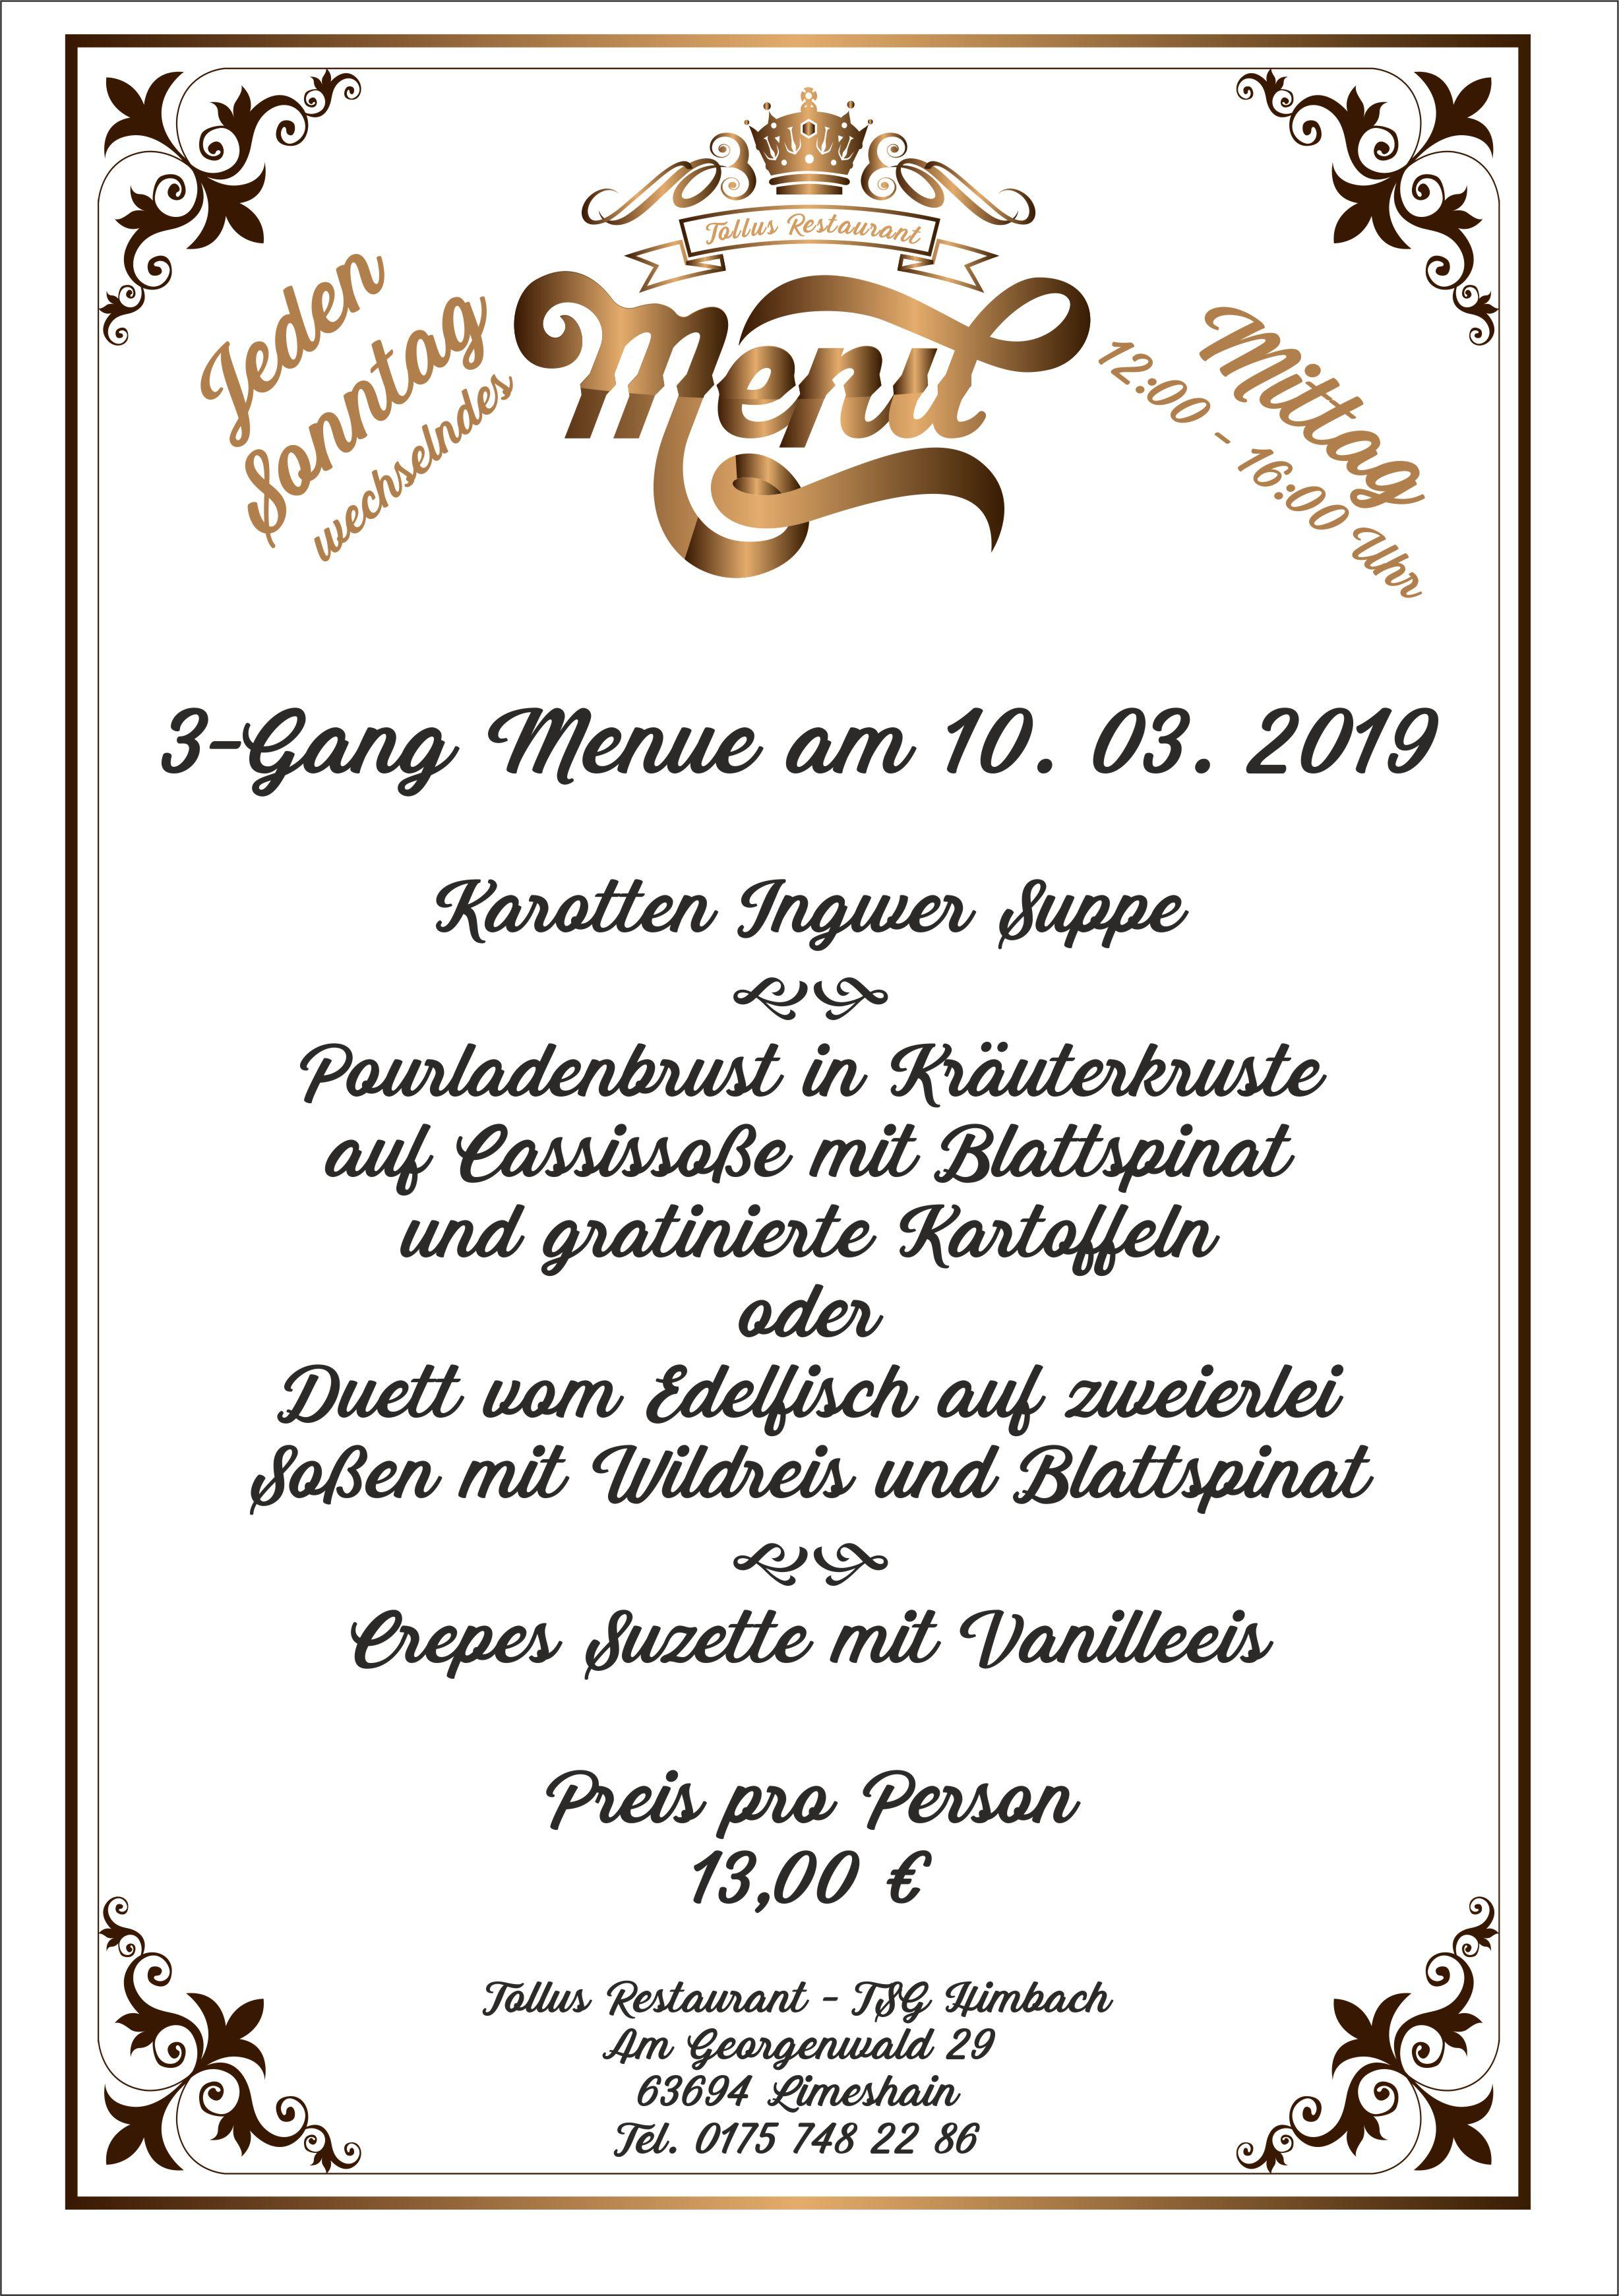 Sonntags Mittags Menue 10. 03. 2019